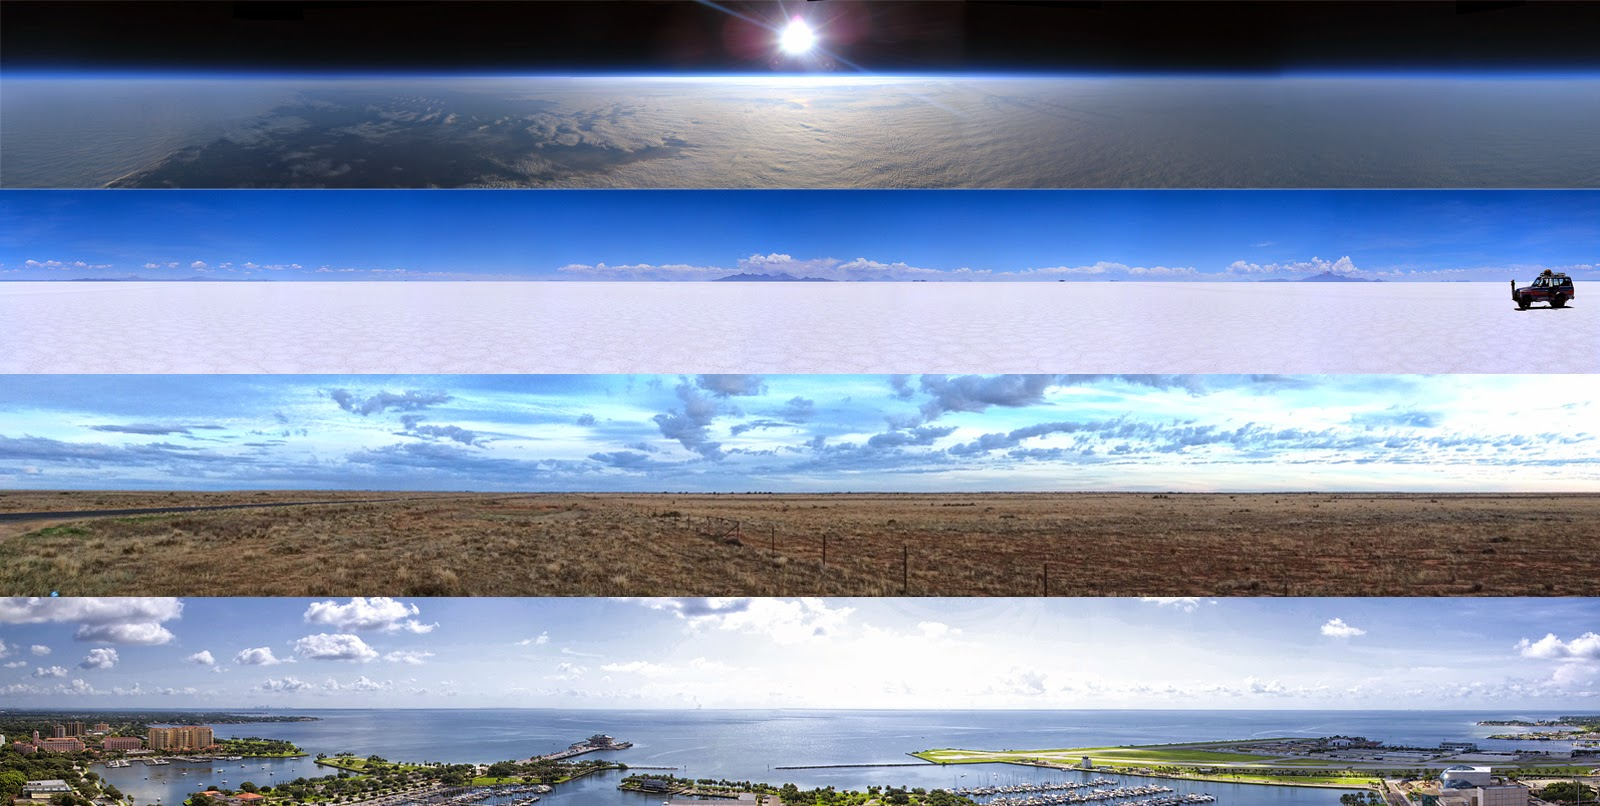 The Atlantean Conspiracy: The Measurable Non-Curvature of